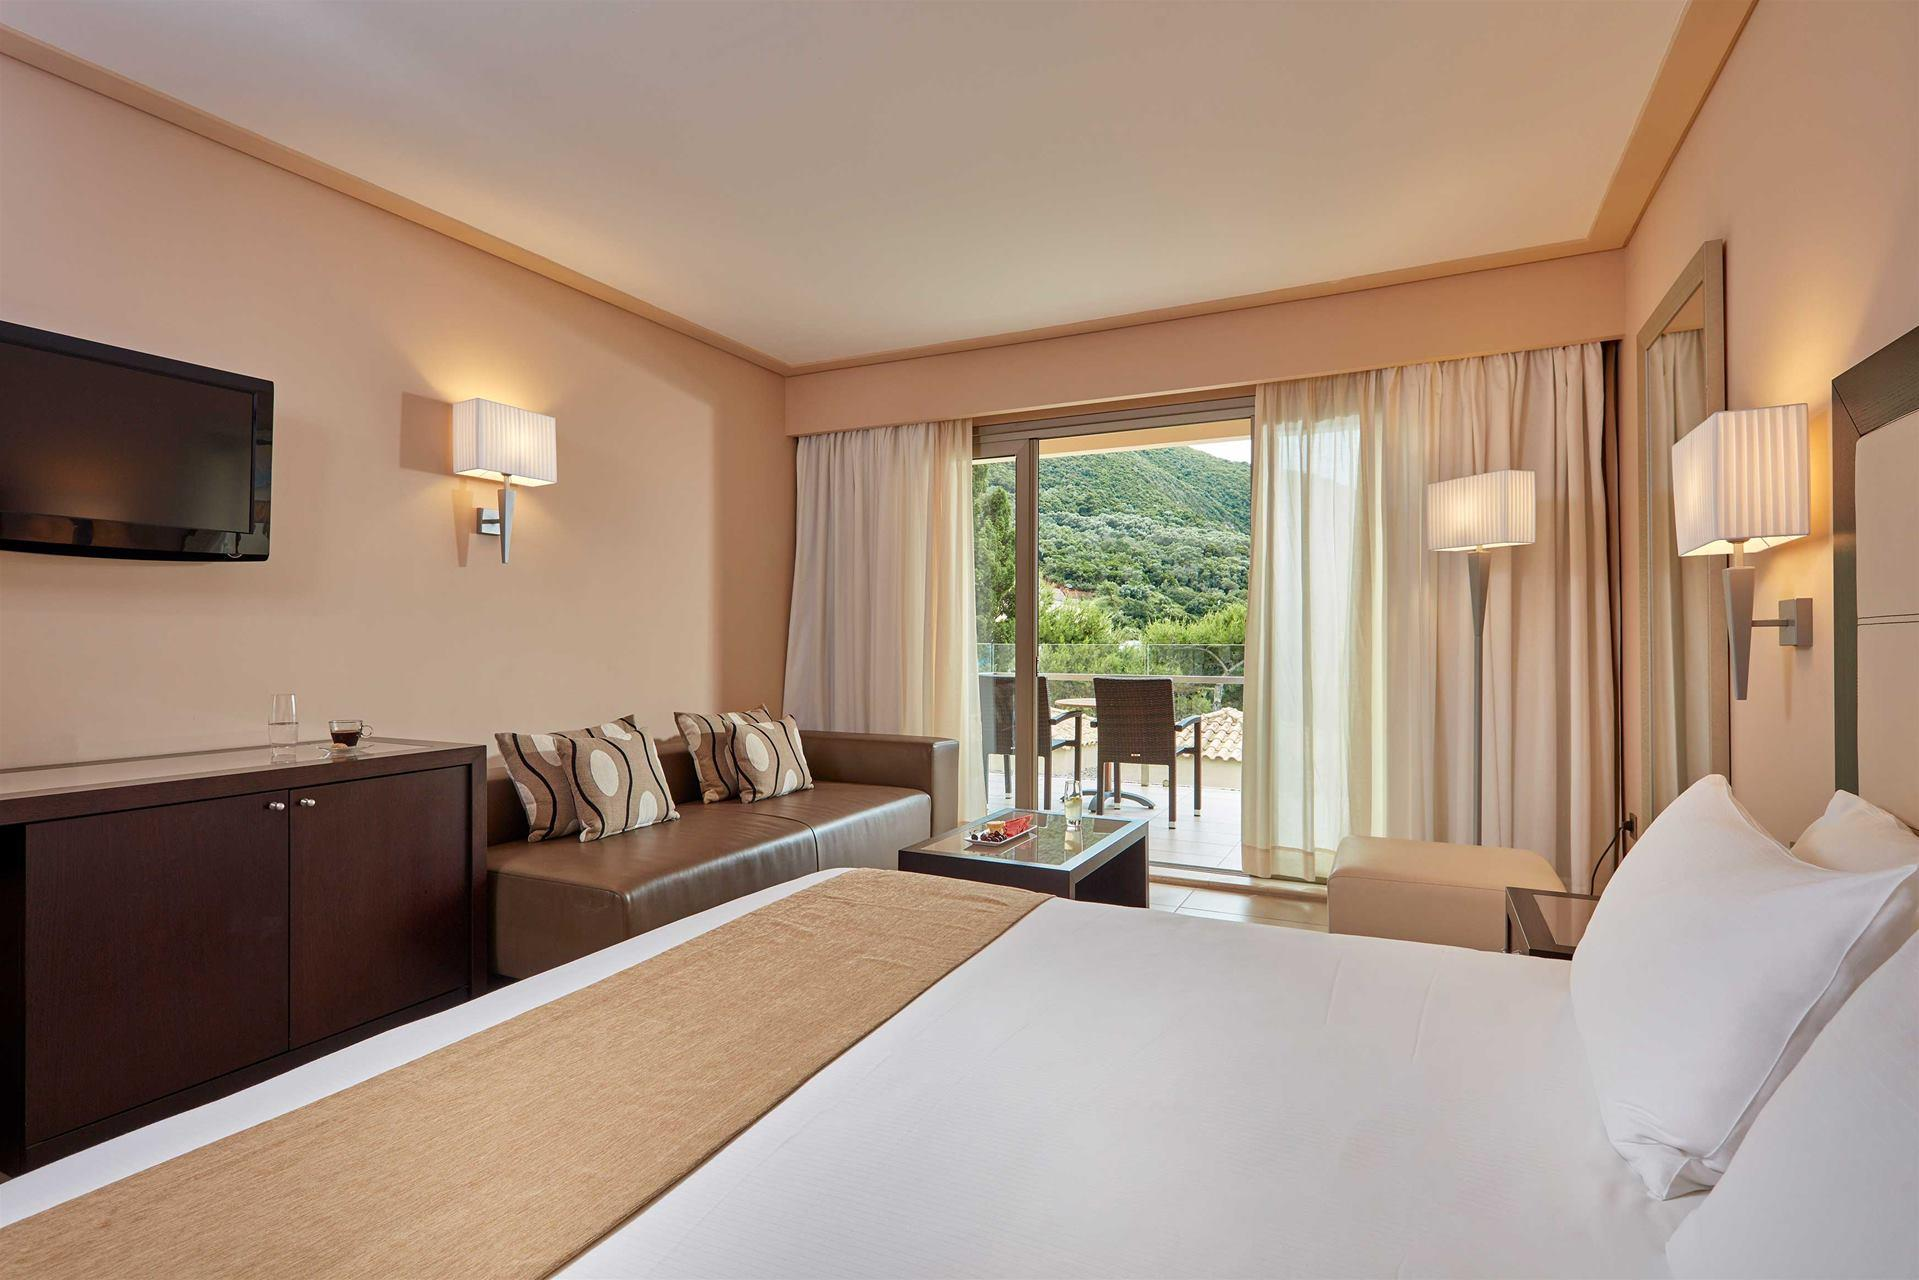 atlantica-grand-mediterraneo-resort-spa-genel-0012